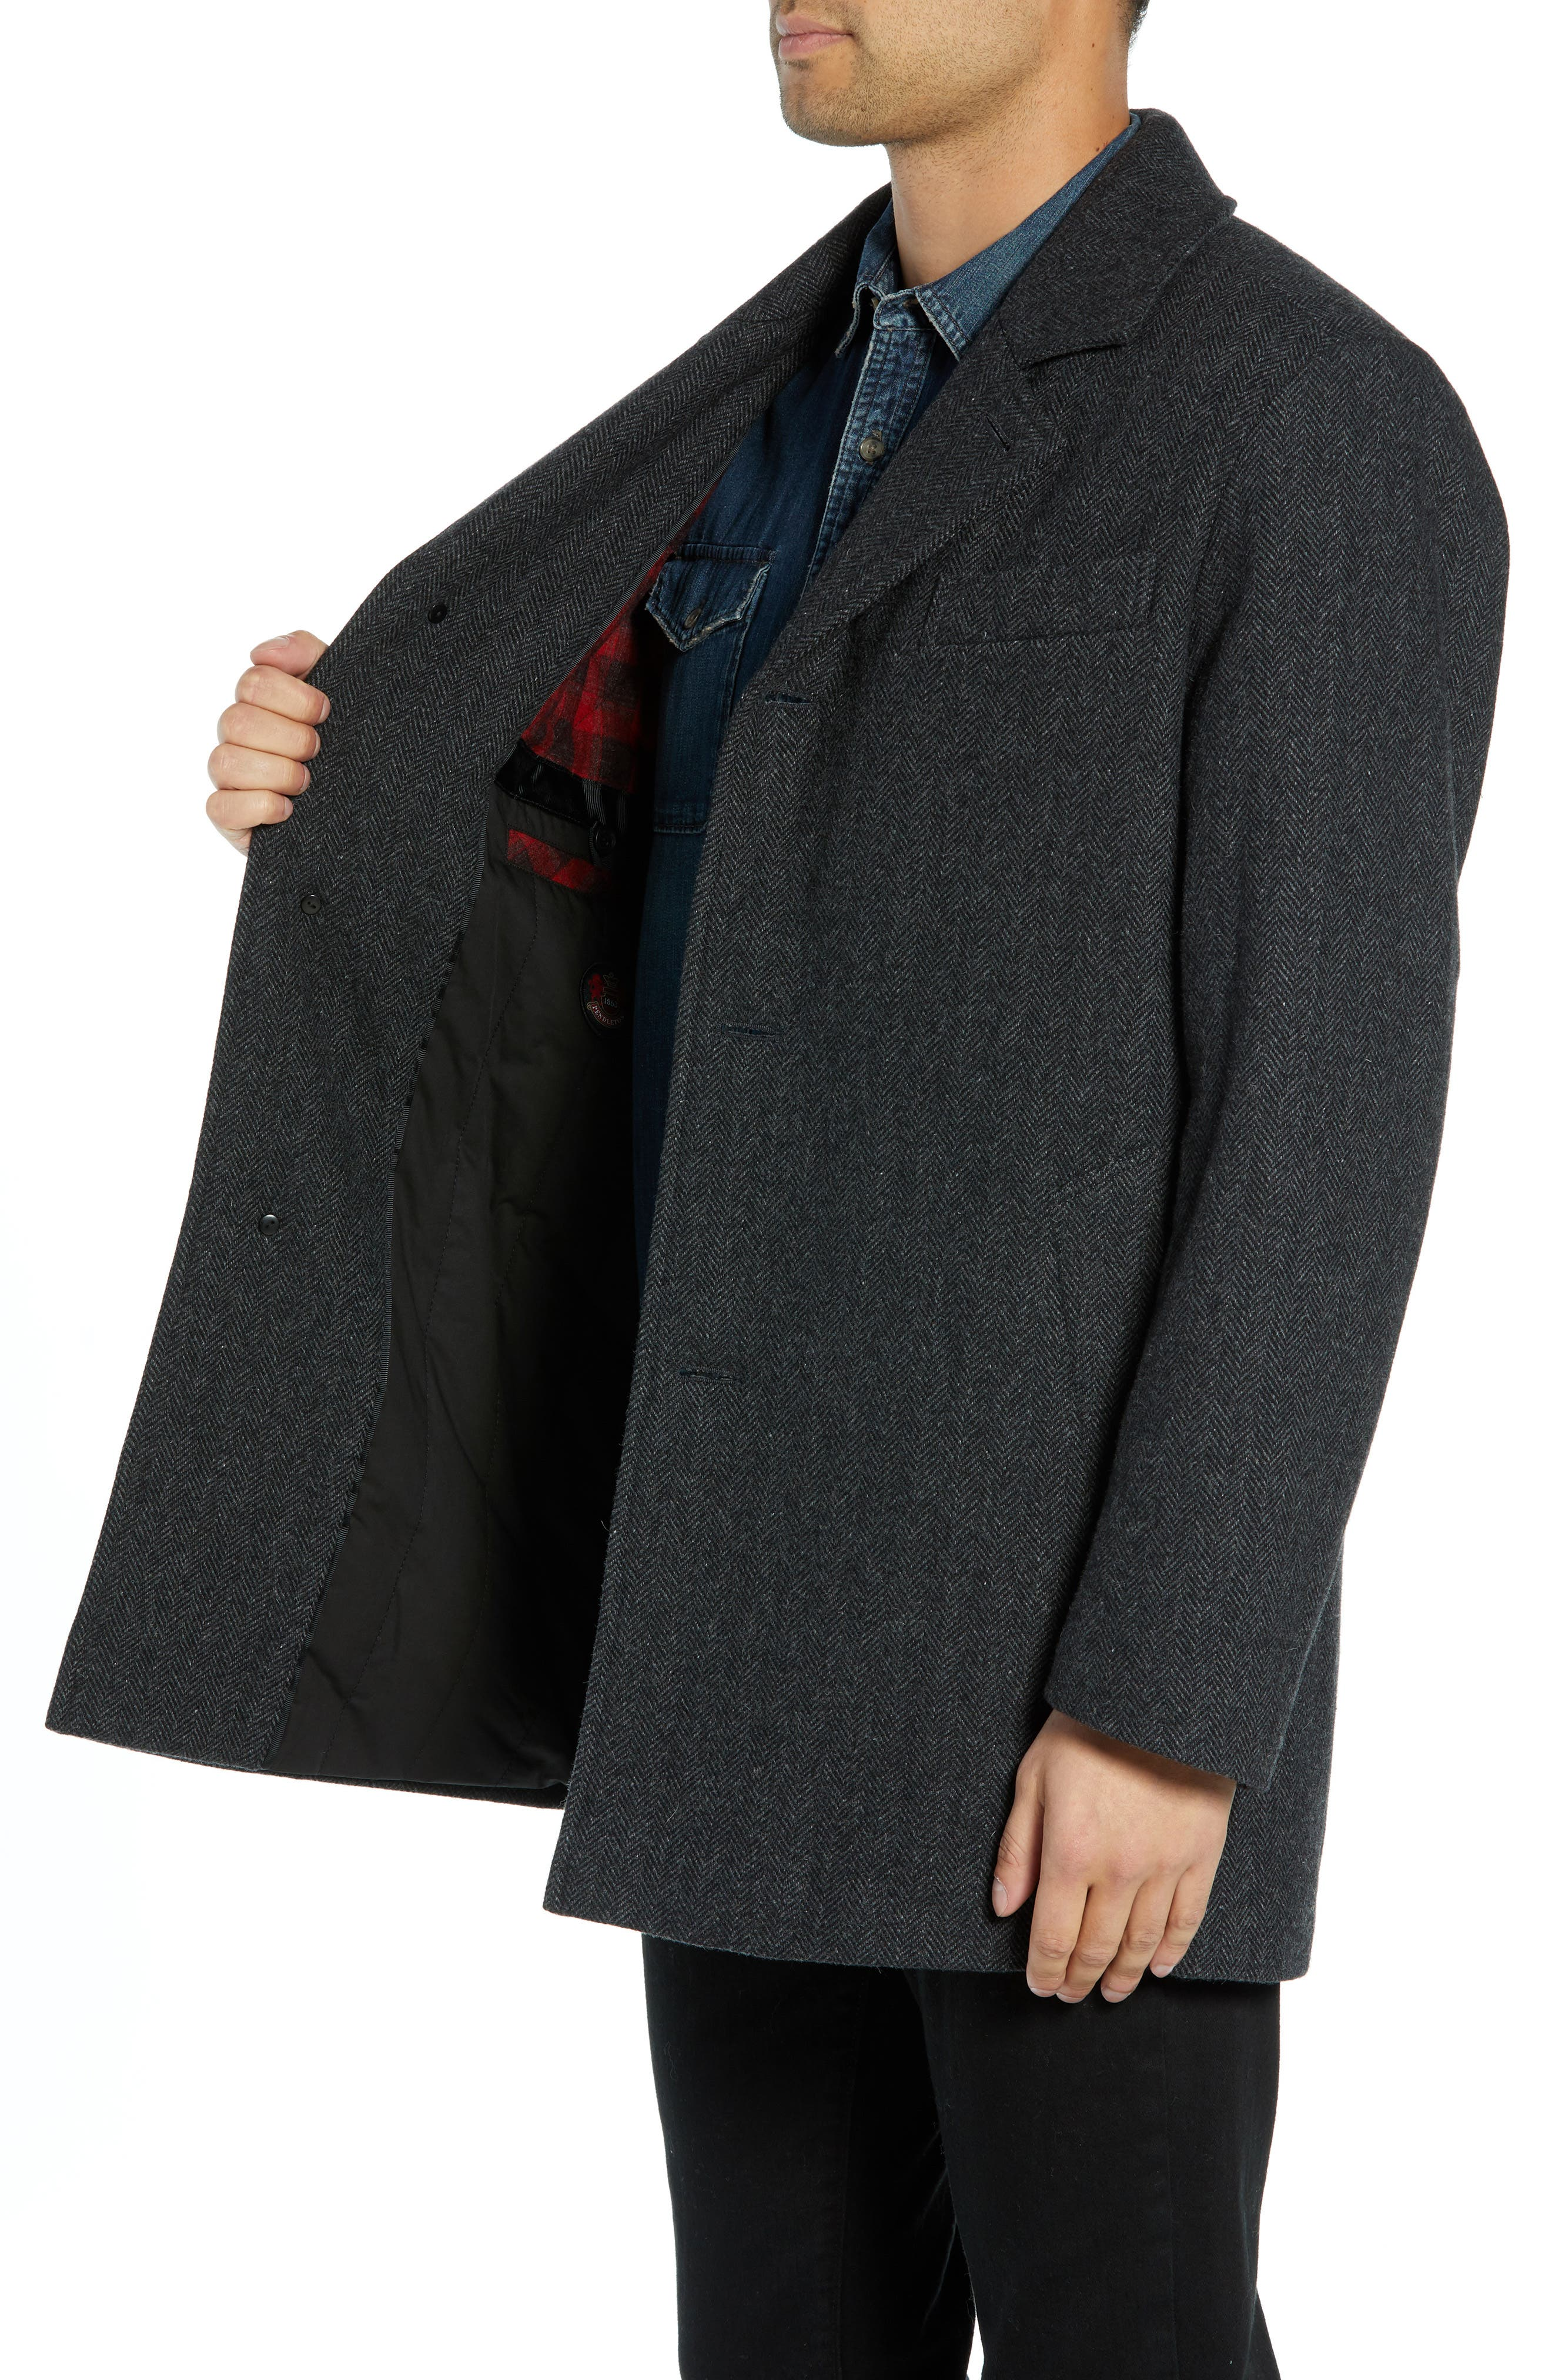 PENDLETON, Iconic Textures Manhattan Wool Blend Top Coat, Alternate thumbnail 4, color, CHARCOAL HERRINGBONE